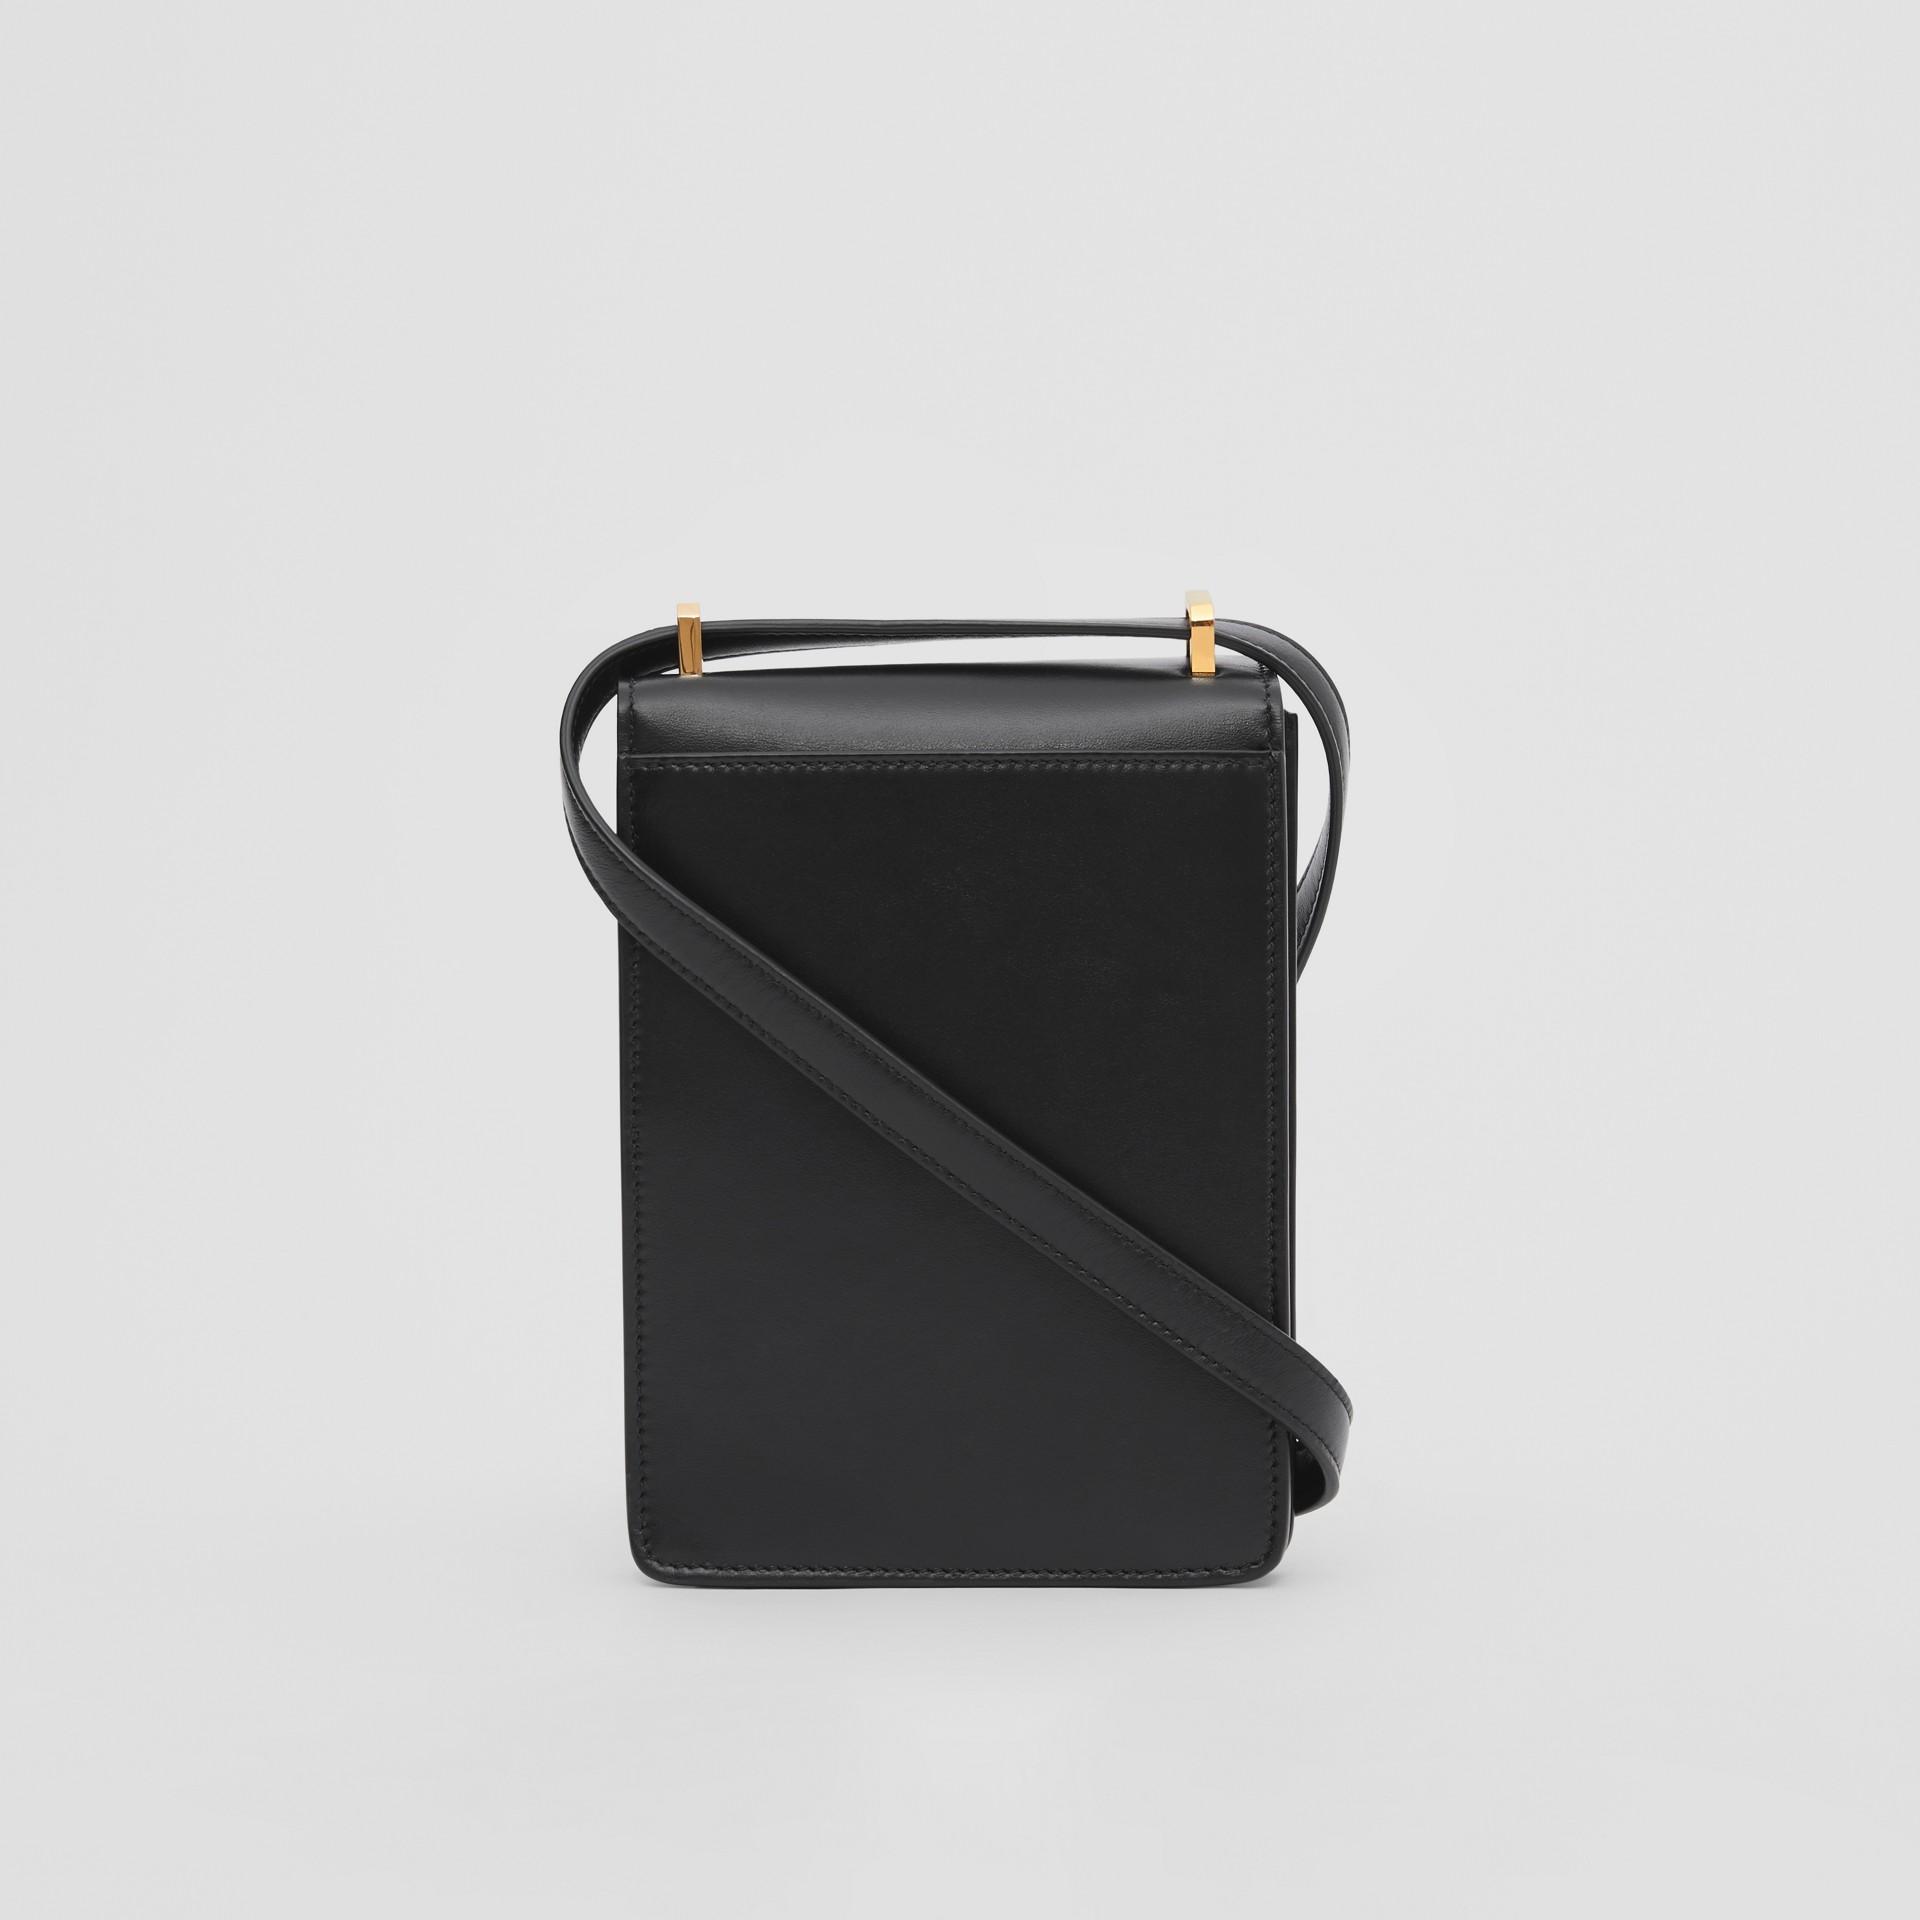 Leather Robin Bag in Black - Women | Burberry Australia - gallery image 9